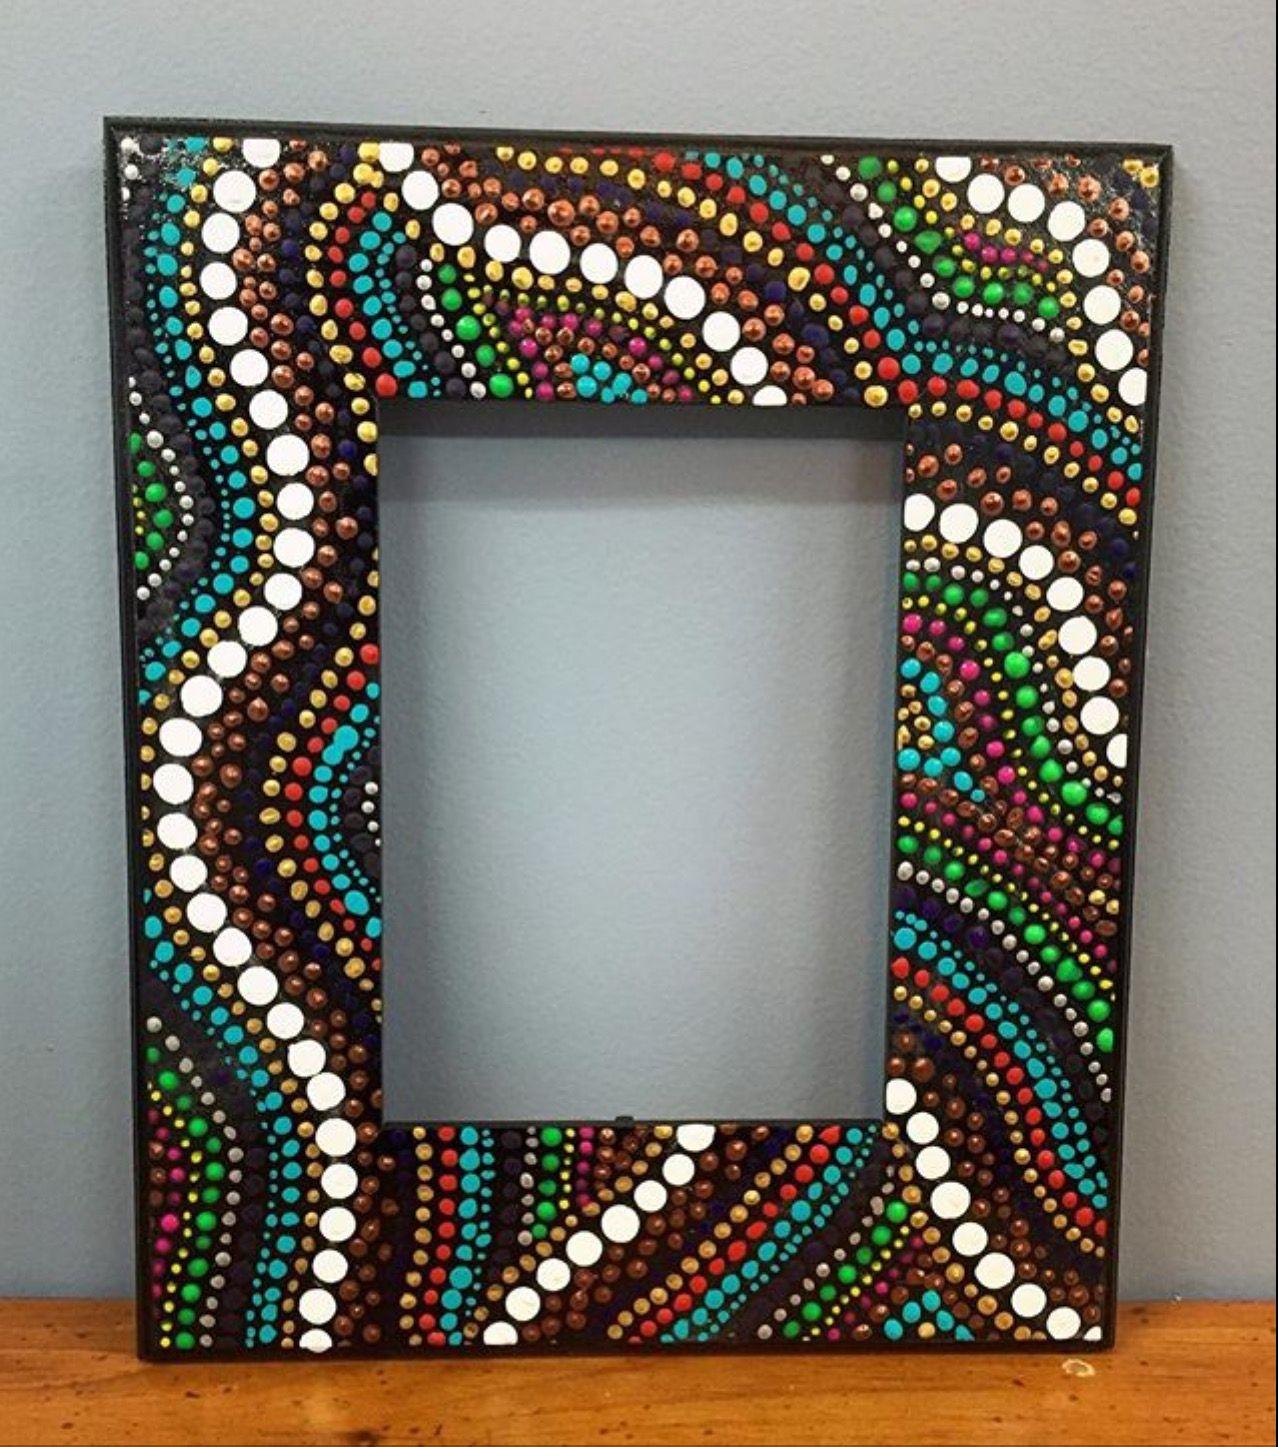 Pin de tamara romero en puntillismo pinterest for Espejos con marco de madera decorados